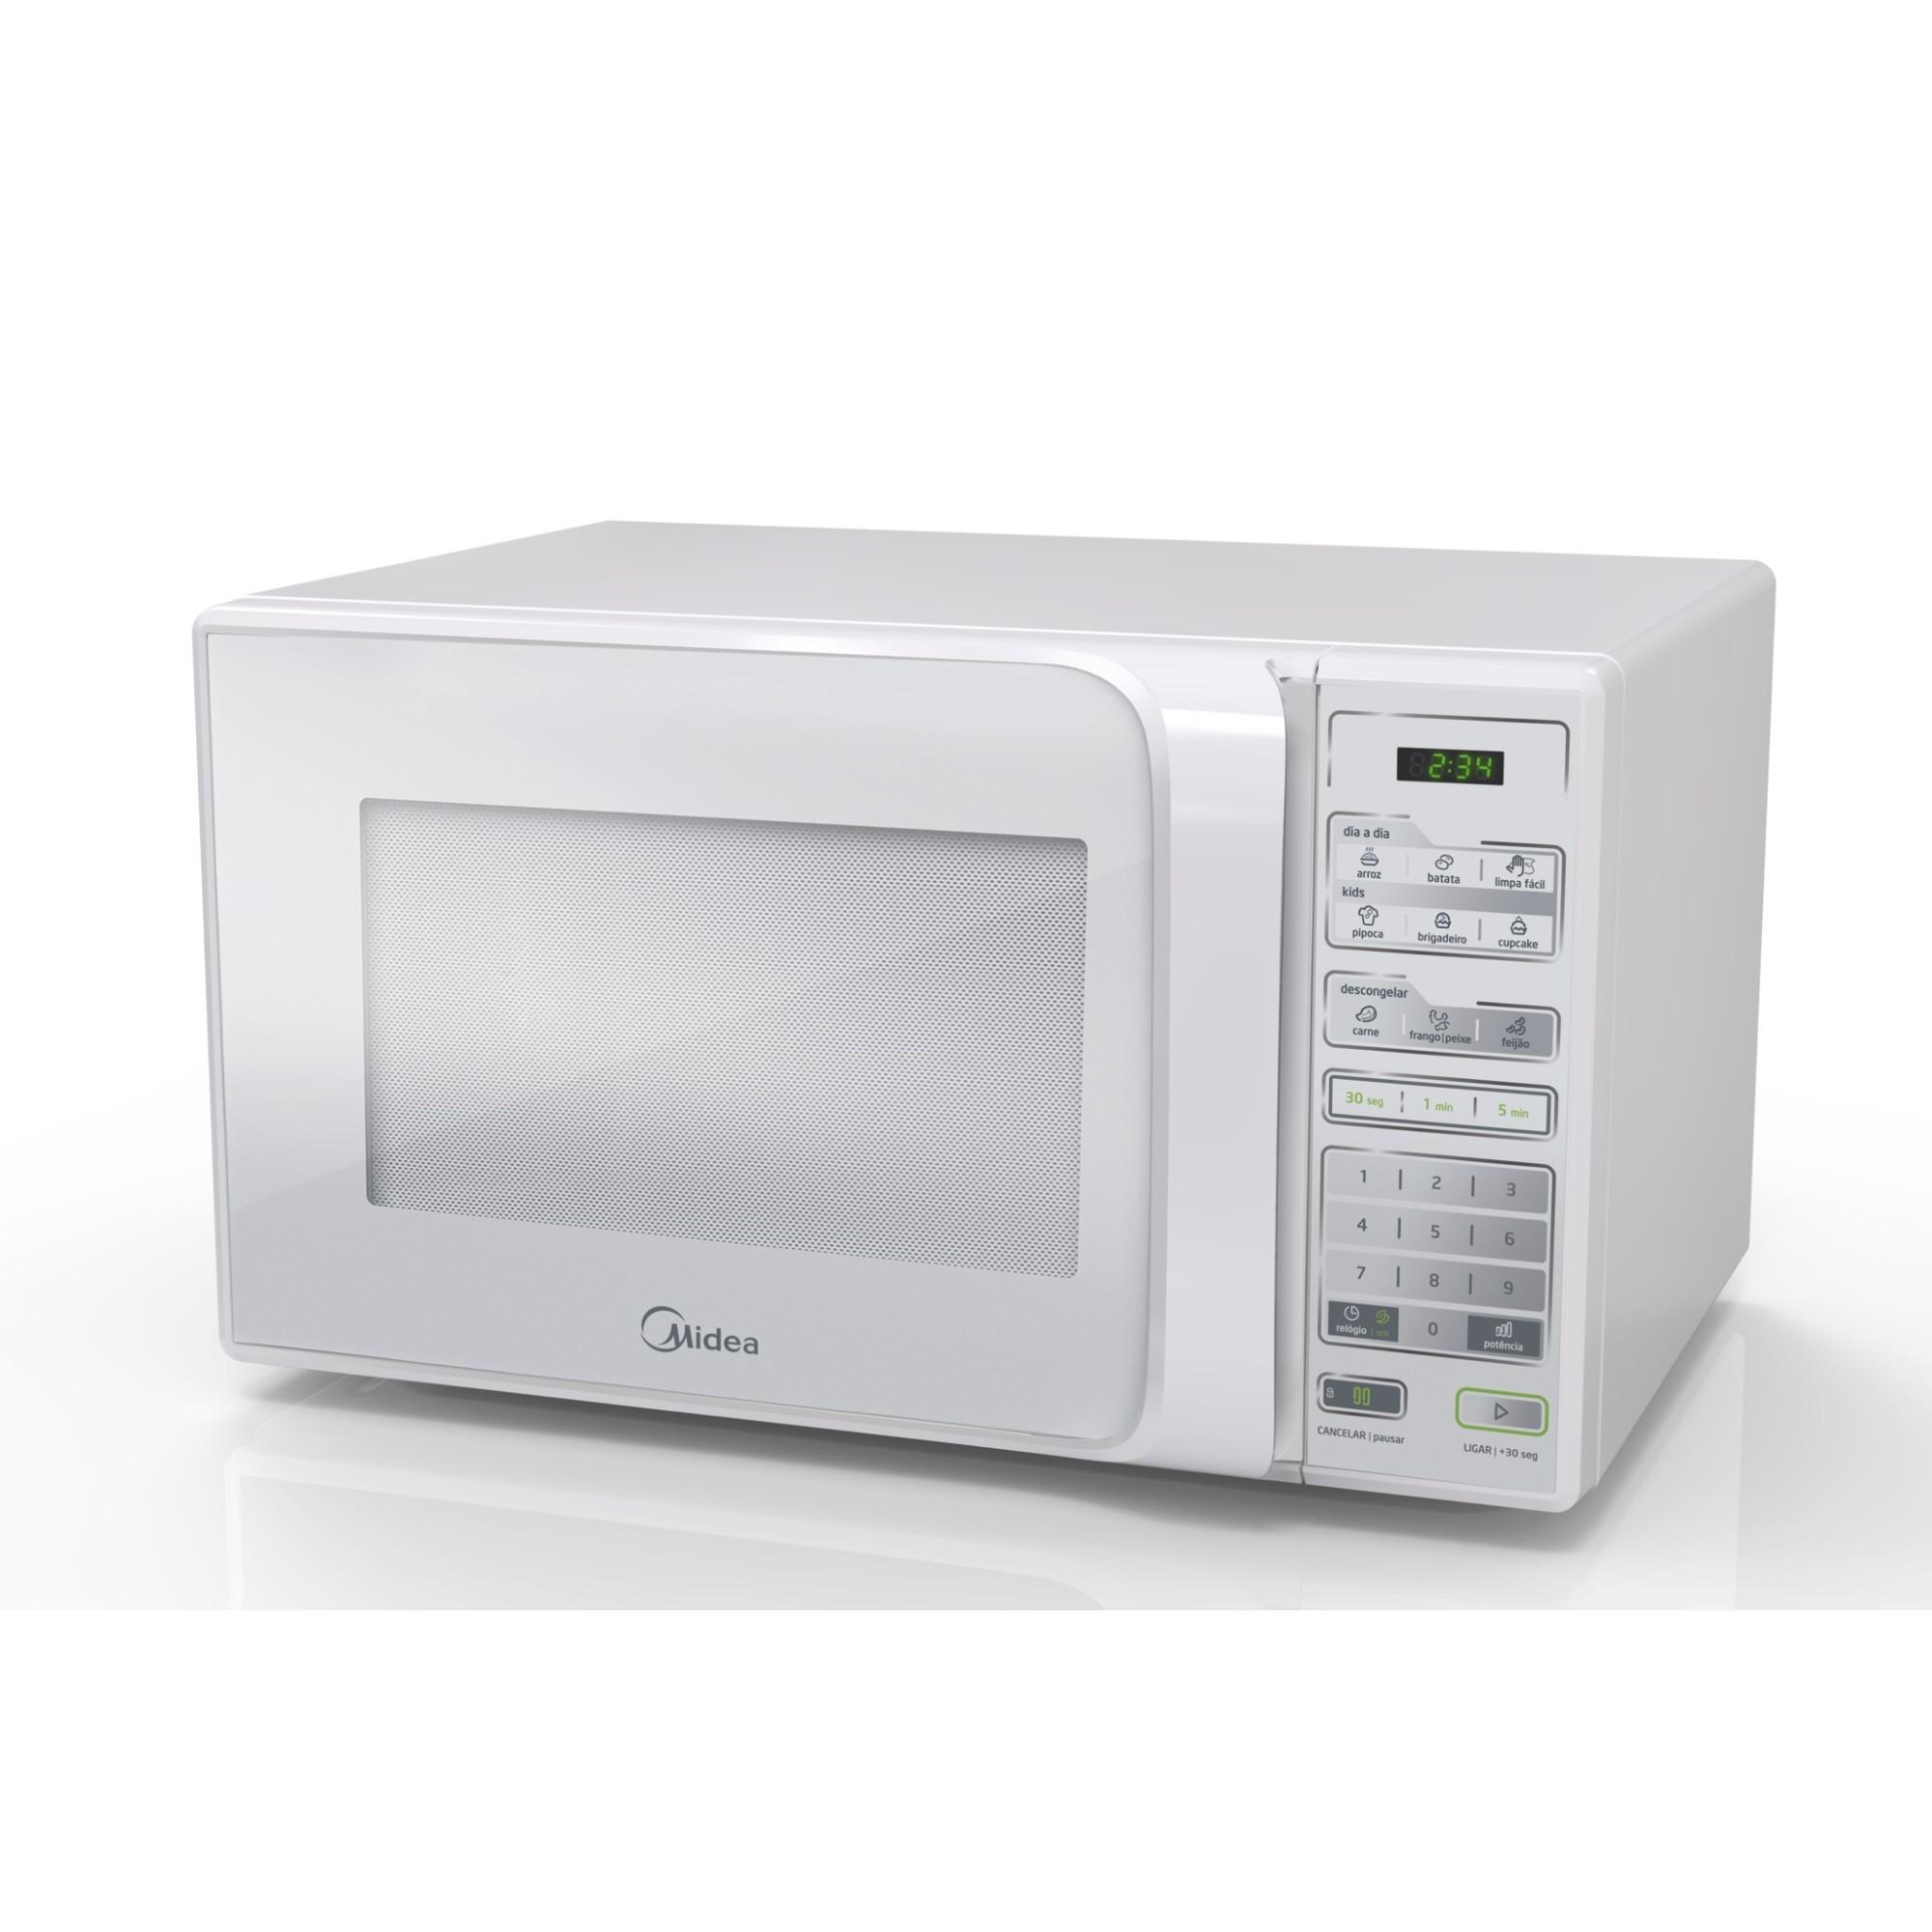 Micro-ondas Midea MTFB22 750w 220V Branco - 20L Painel Touch Timer